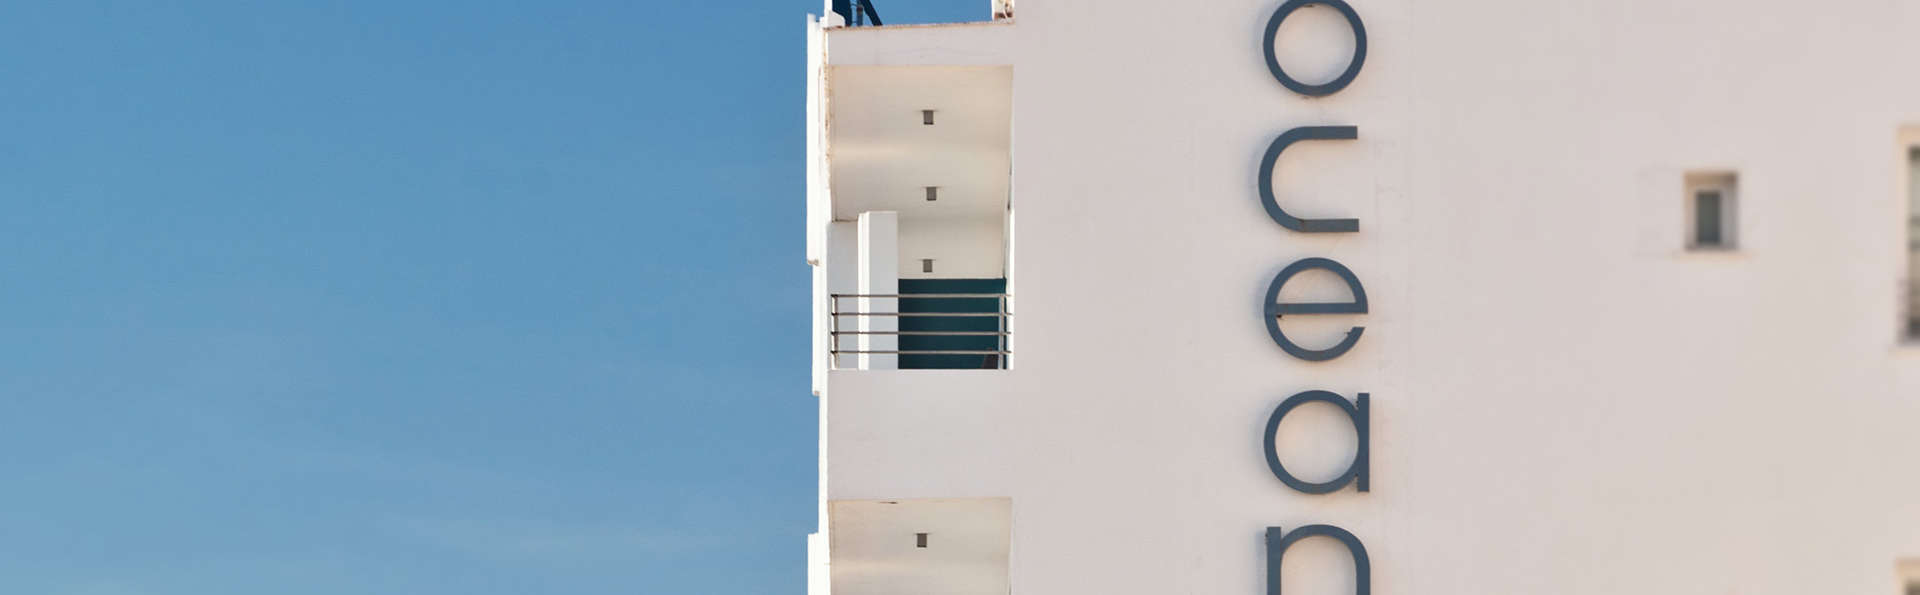 OD Ocean Drive - Edit_Front.jpg